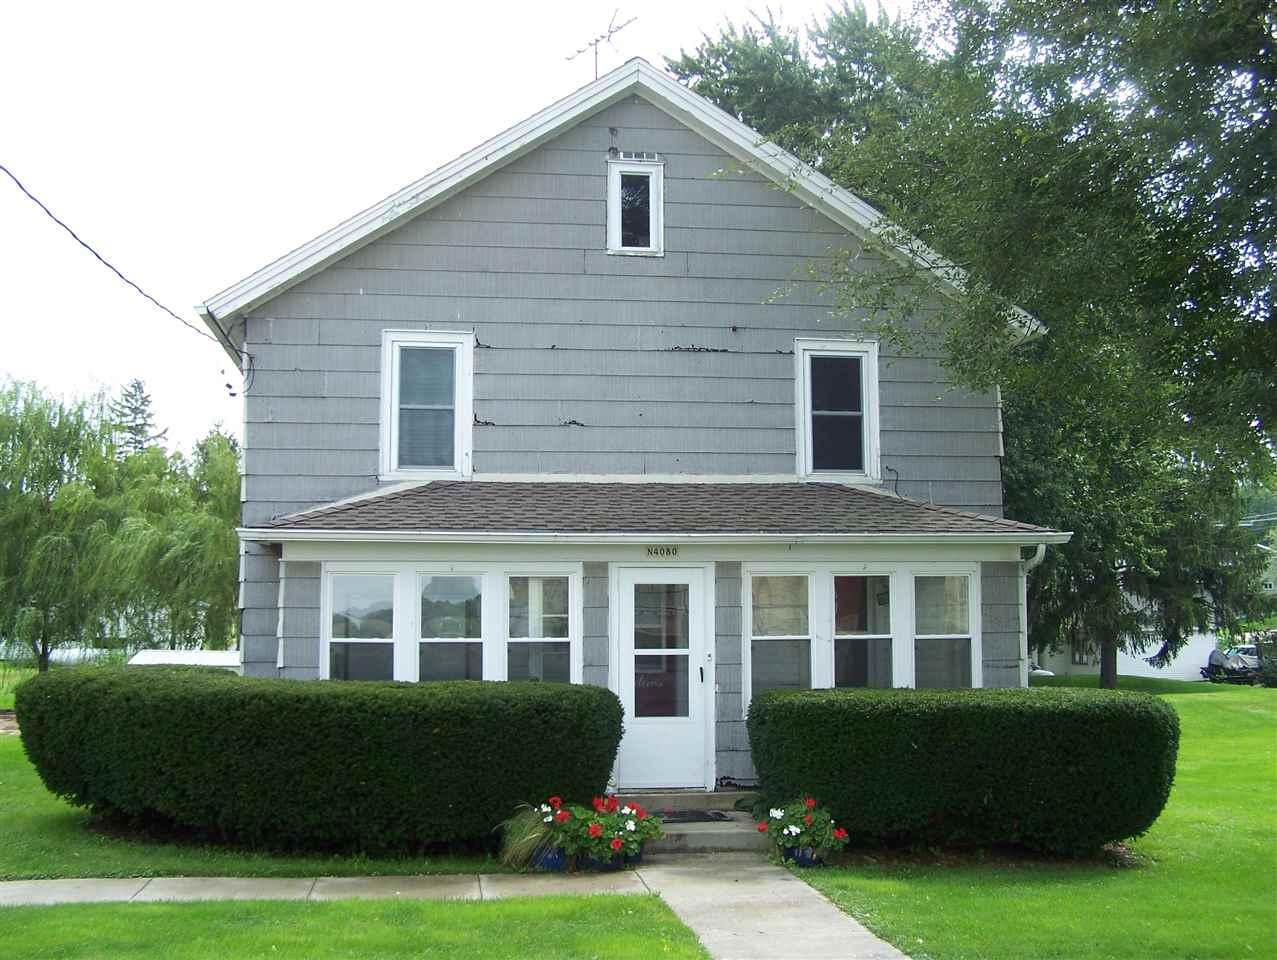 N4080 Bruce St, Doylestown, WI 53928